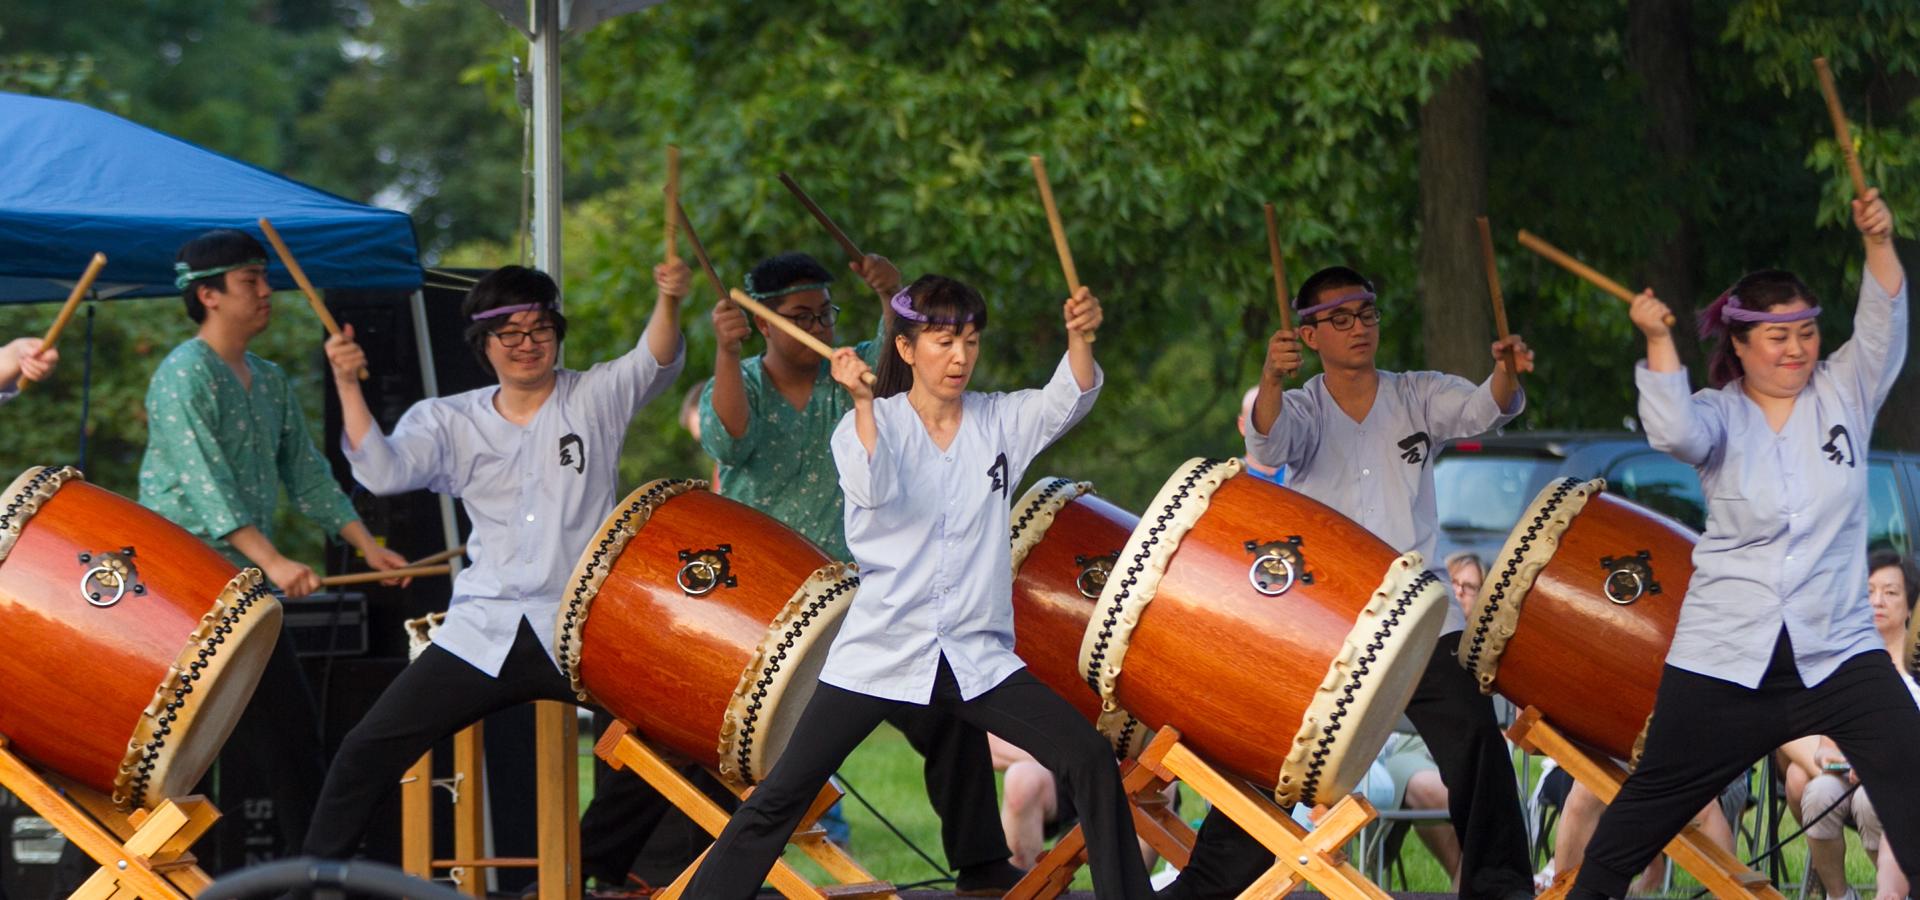 Drummers at Destination Asia Festival